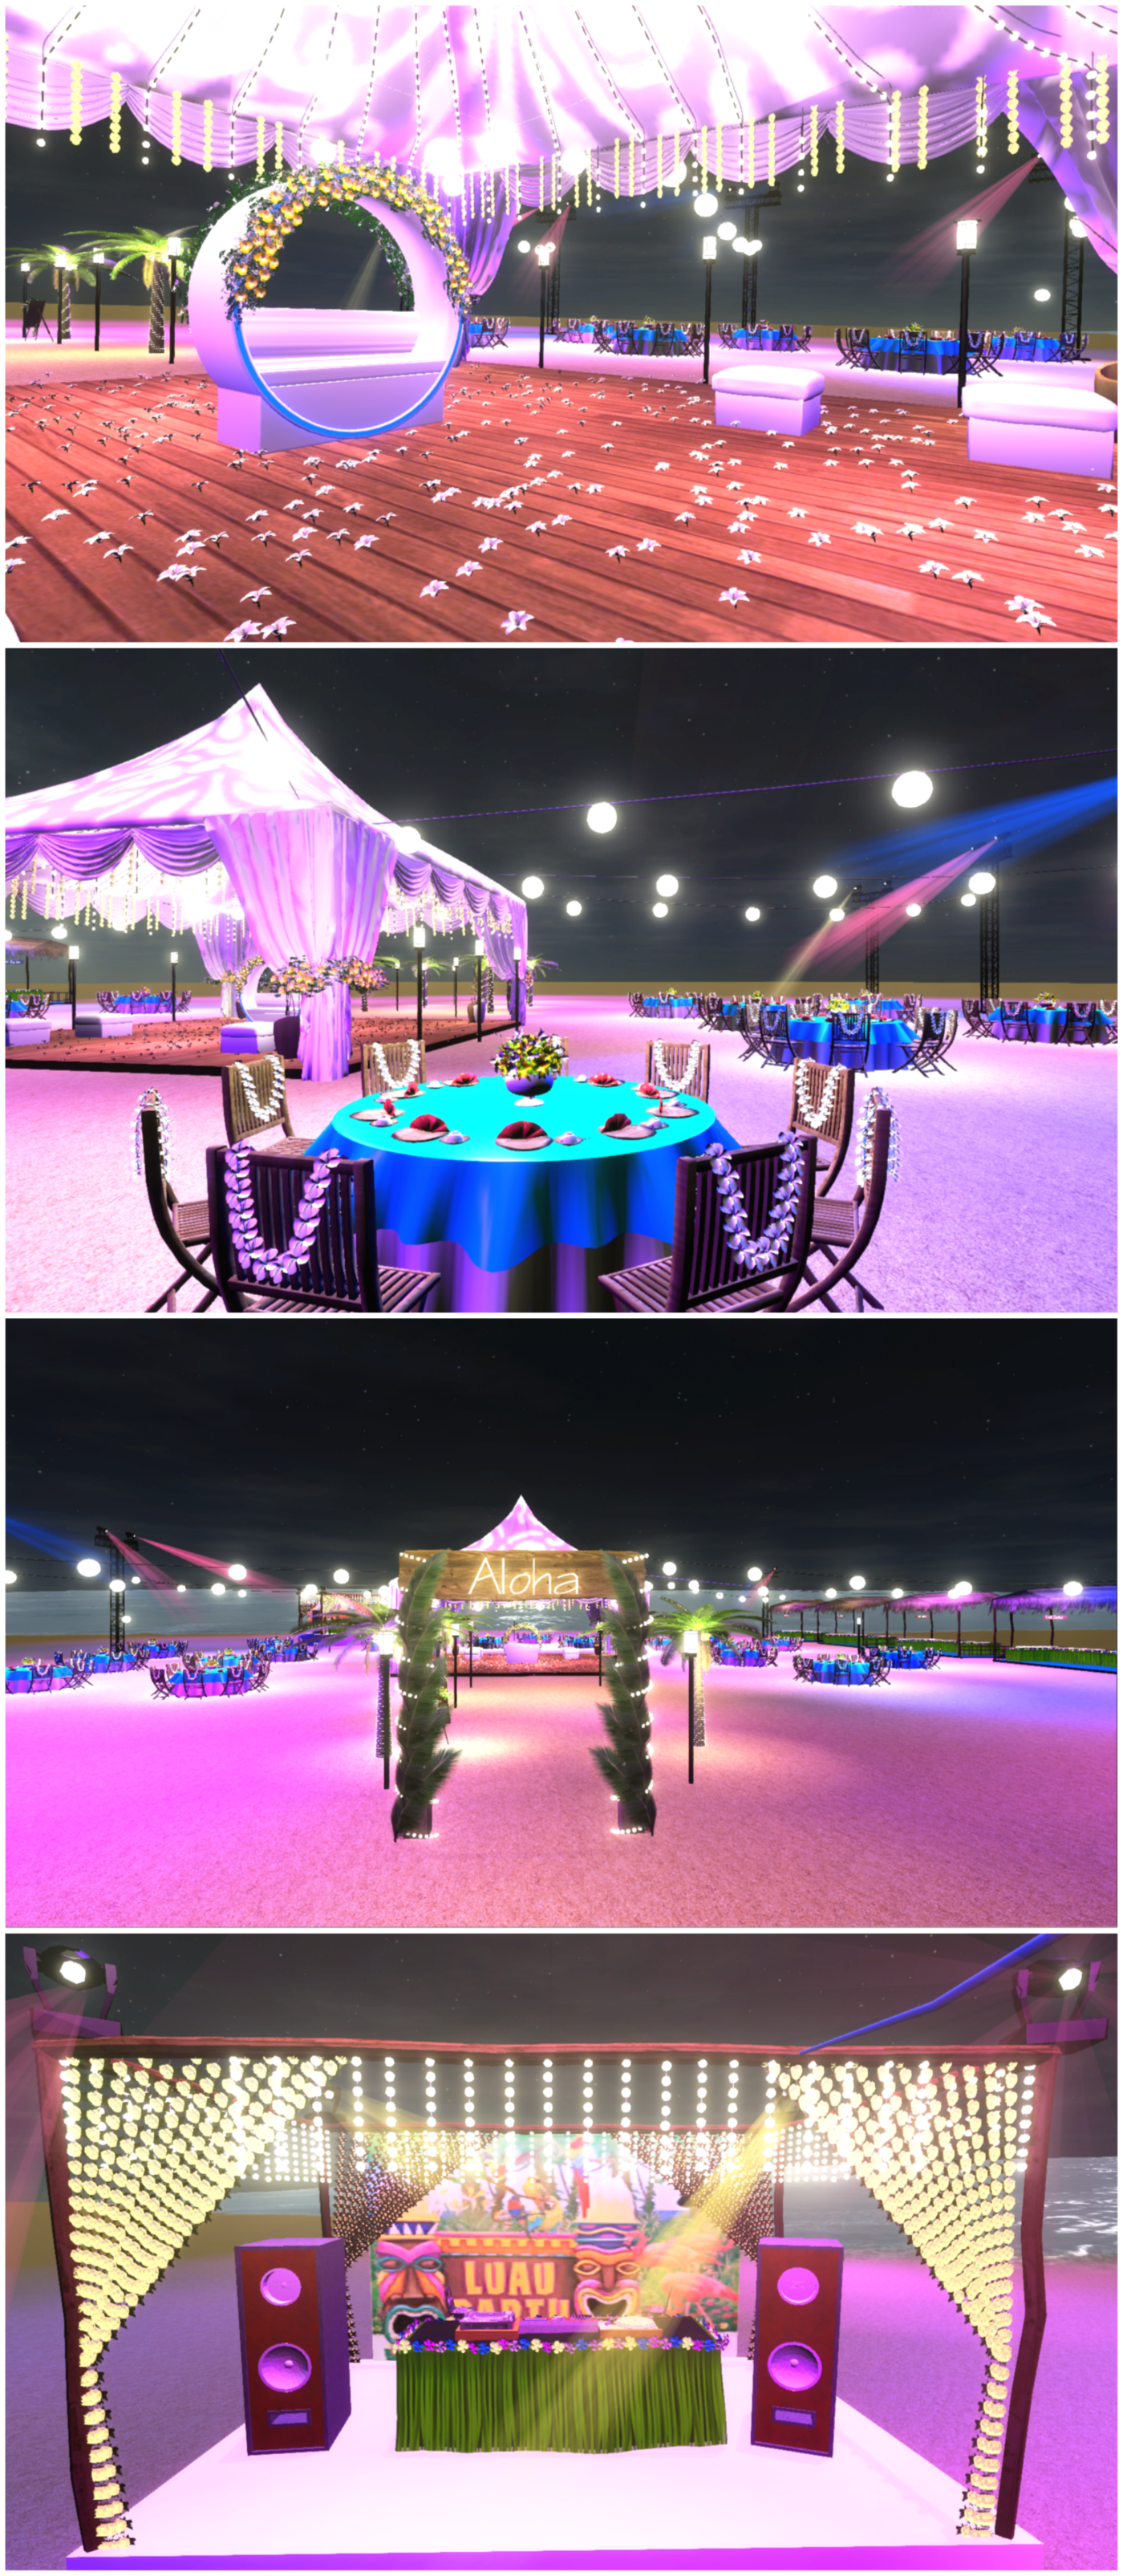 beach theme lighting. Wedding, Beach, Theme Lighting, Decor \u0026 Stages By Komal Mittal Sharma At Coroflot.com Beach Lighting C